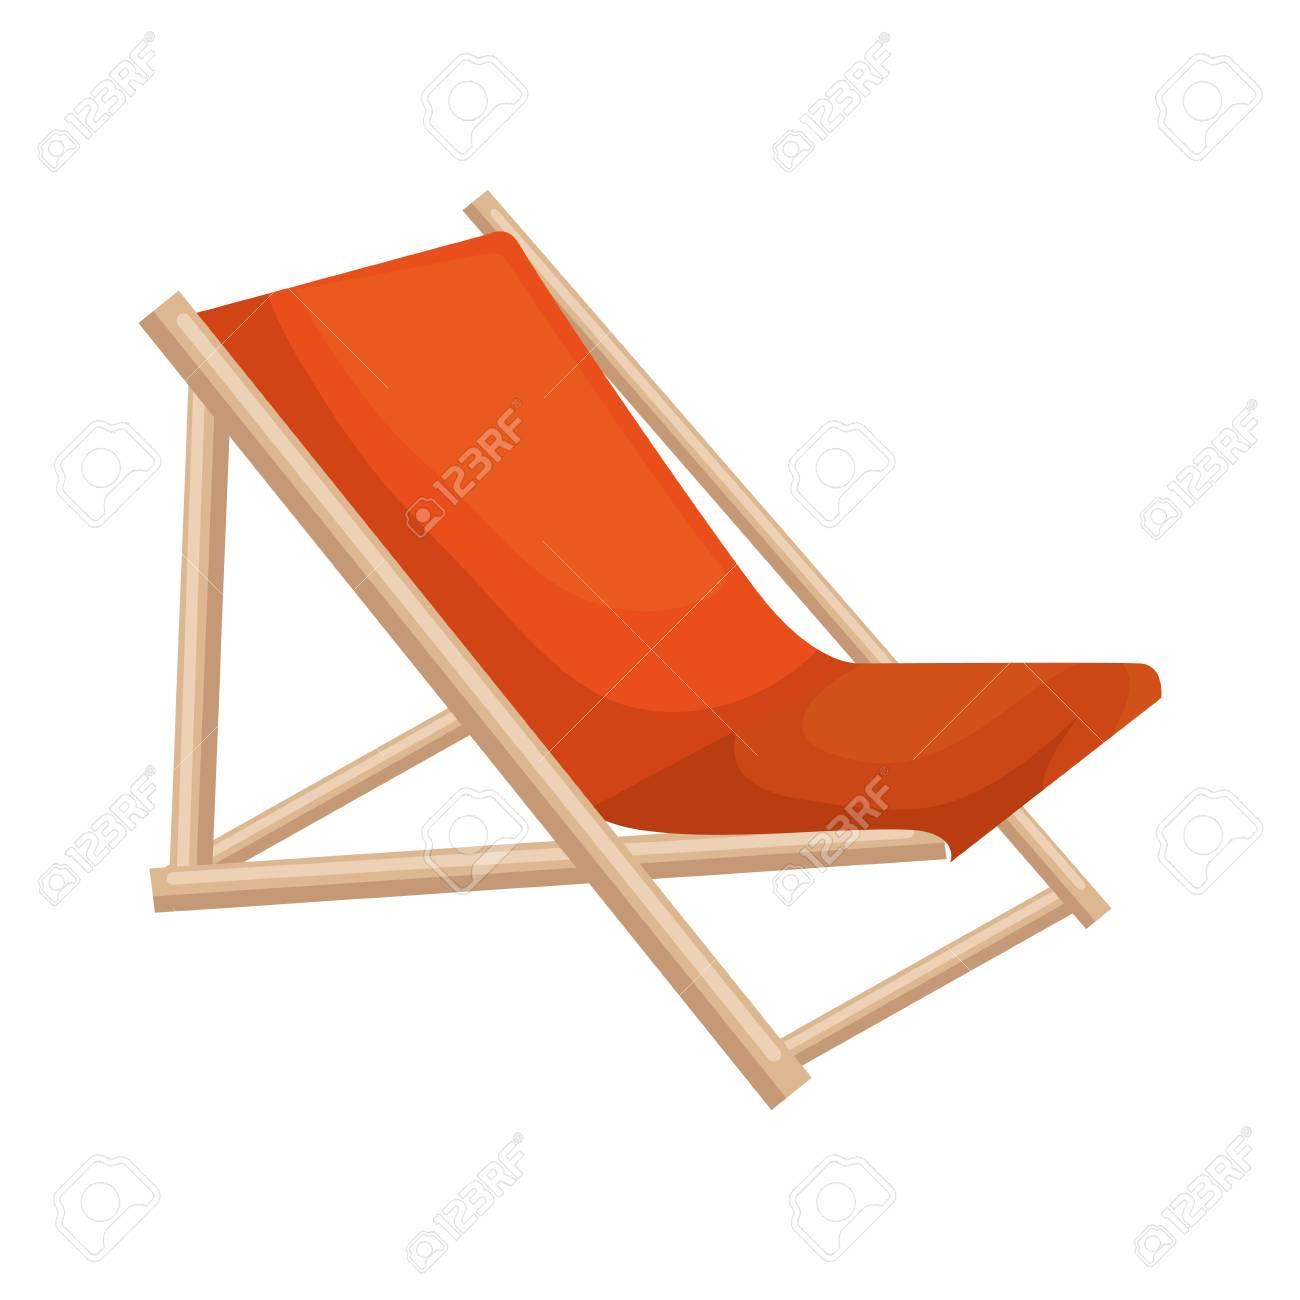 wooden beach chair icon vector illustration design - 112332423